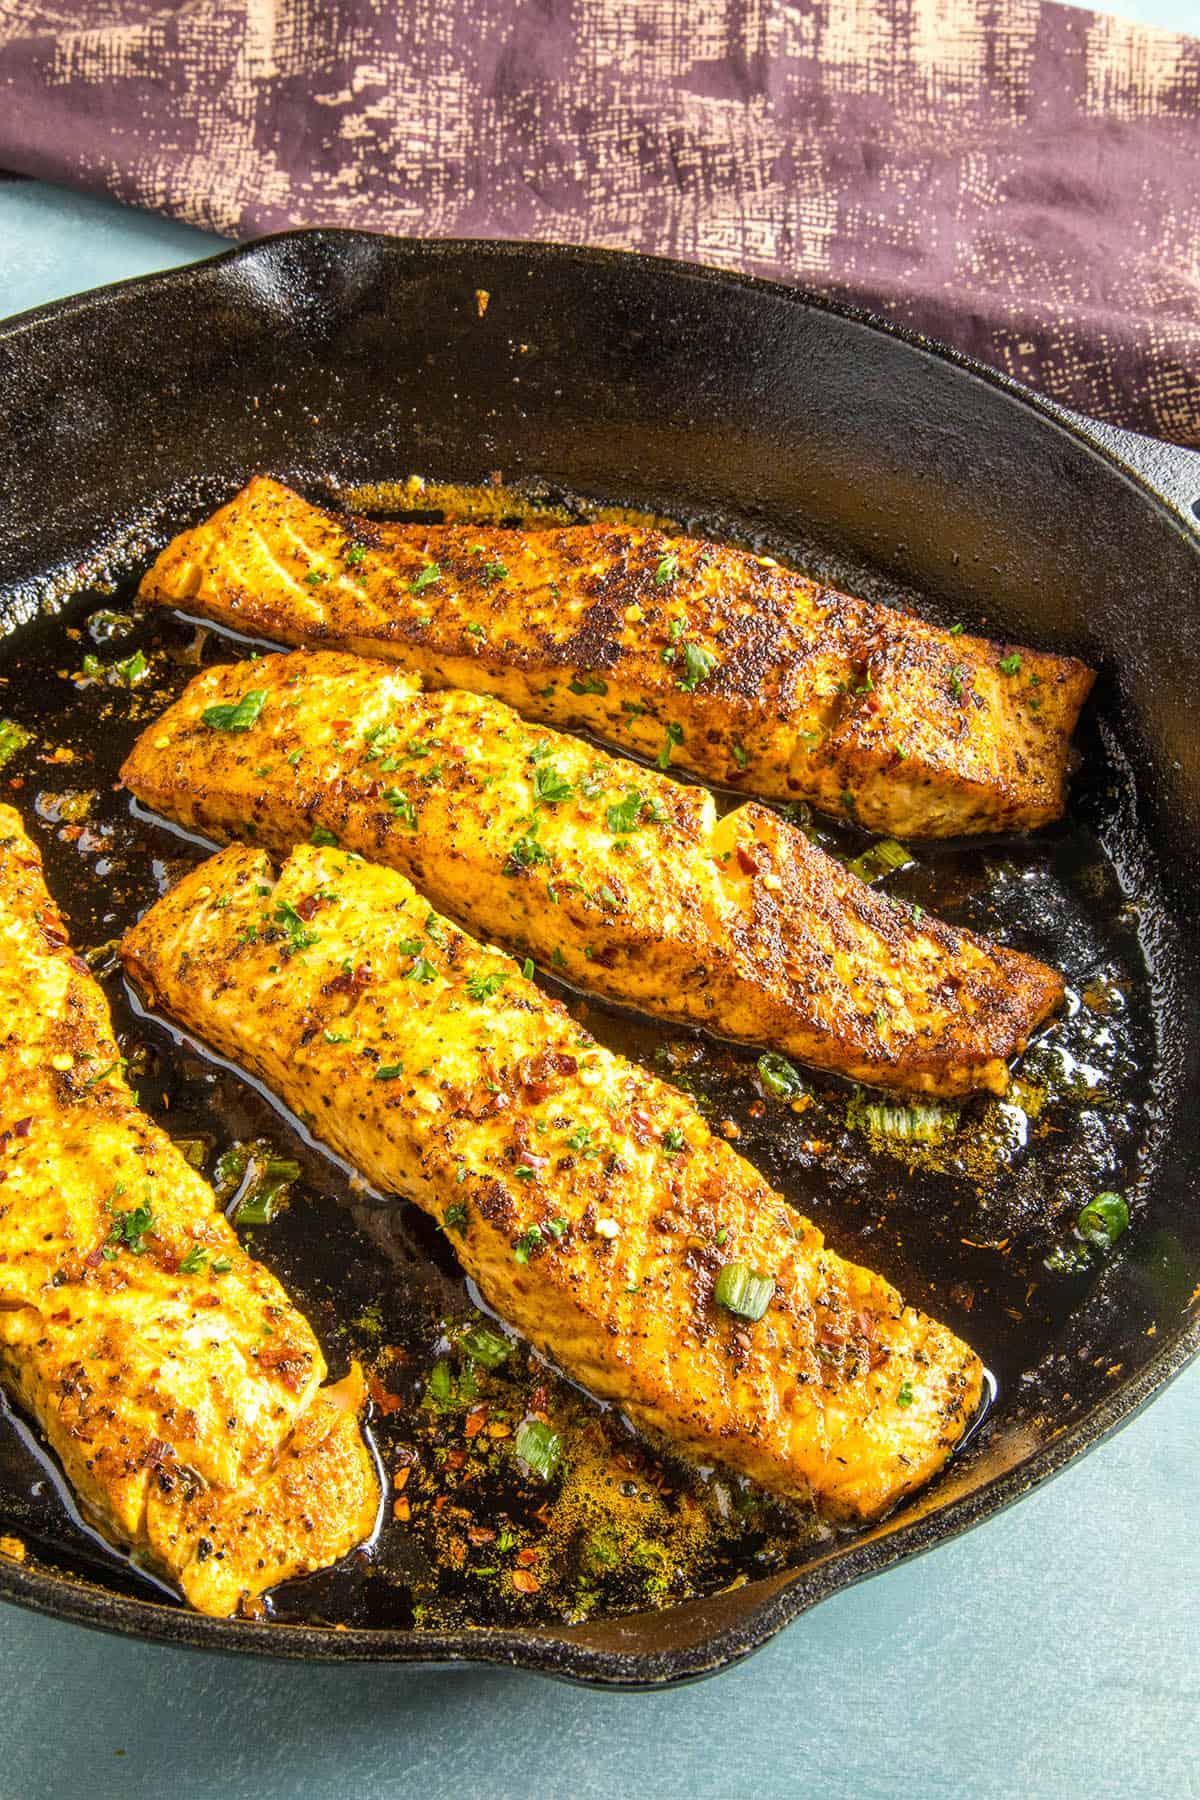 Blackened Salmon in a pan